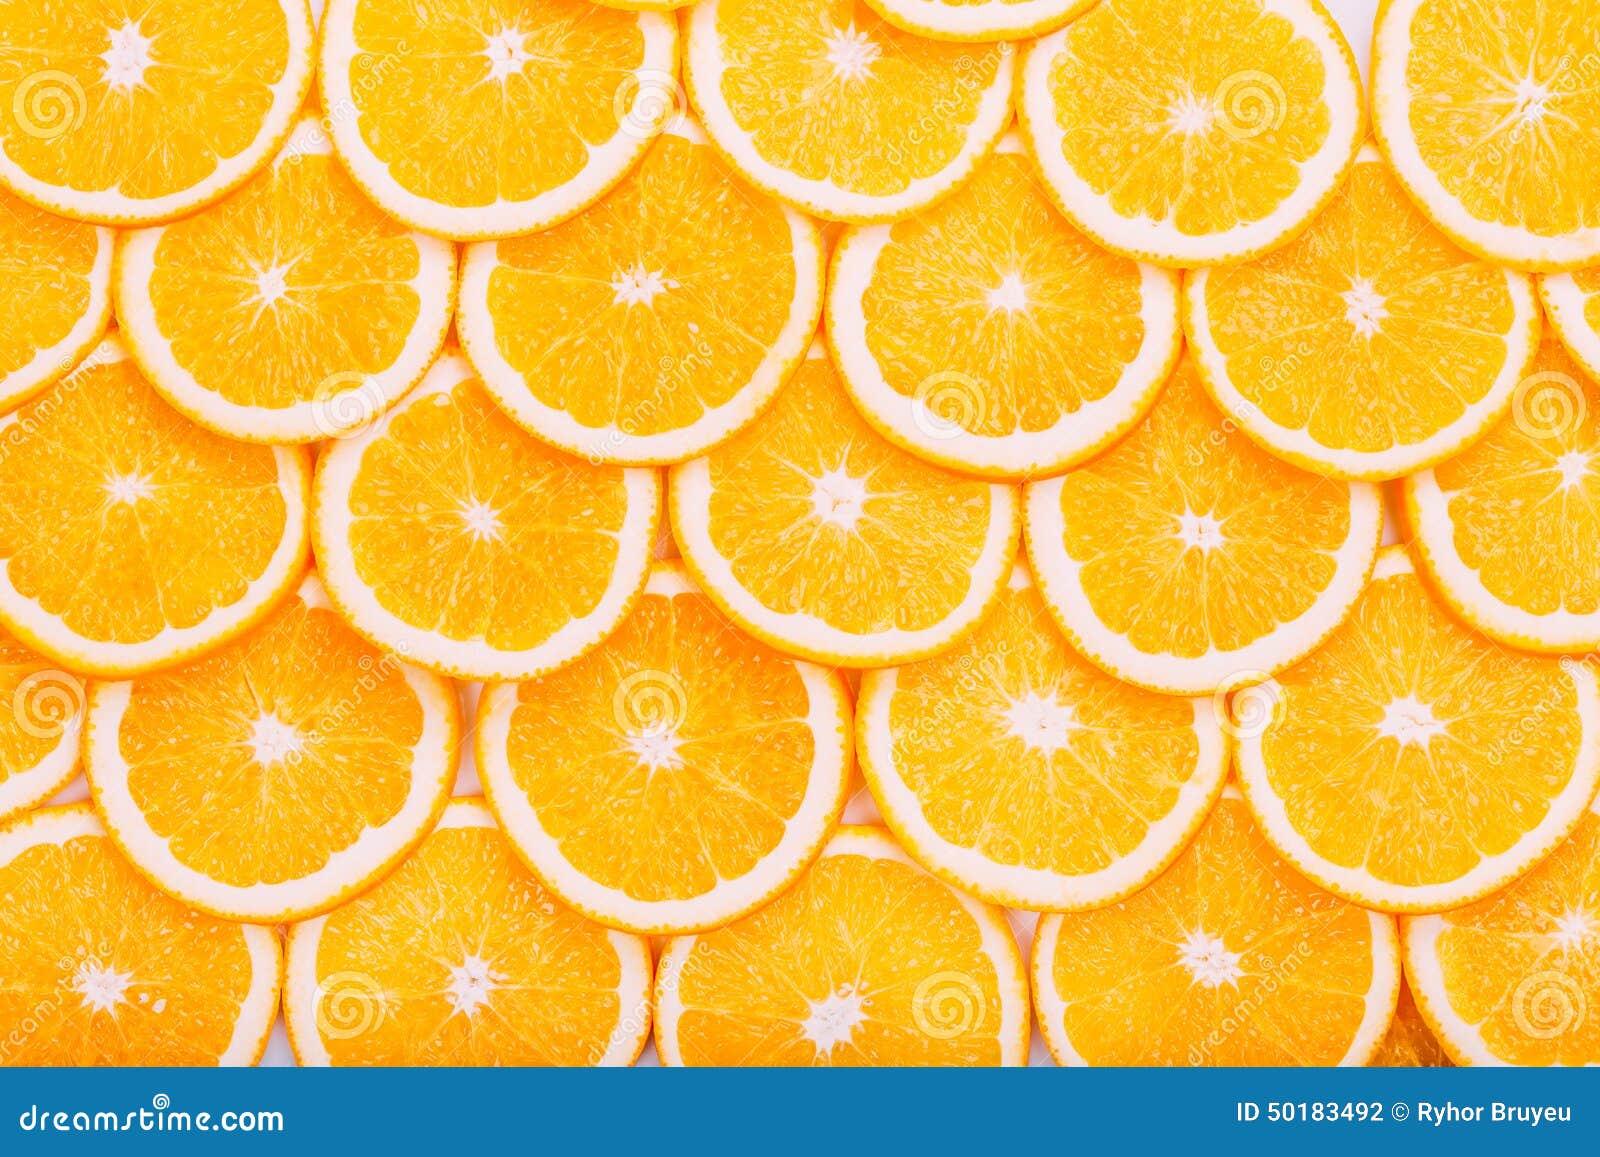 Orange Fruit Background. Summer Oranges. Healthy